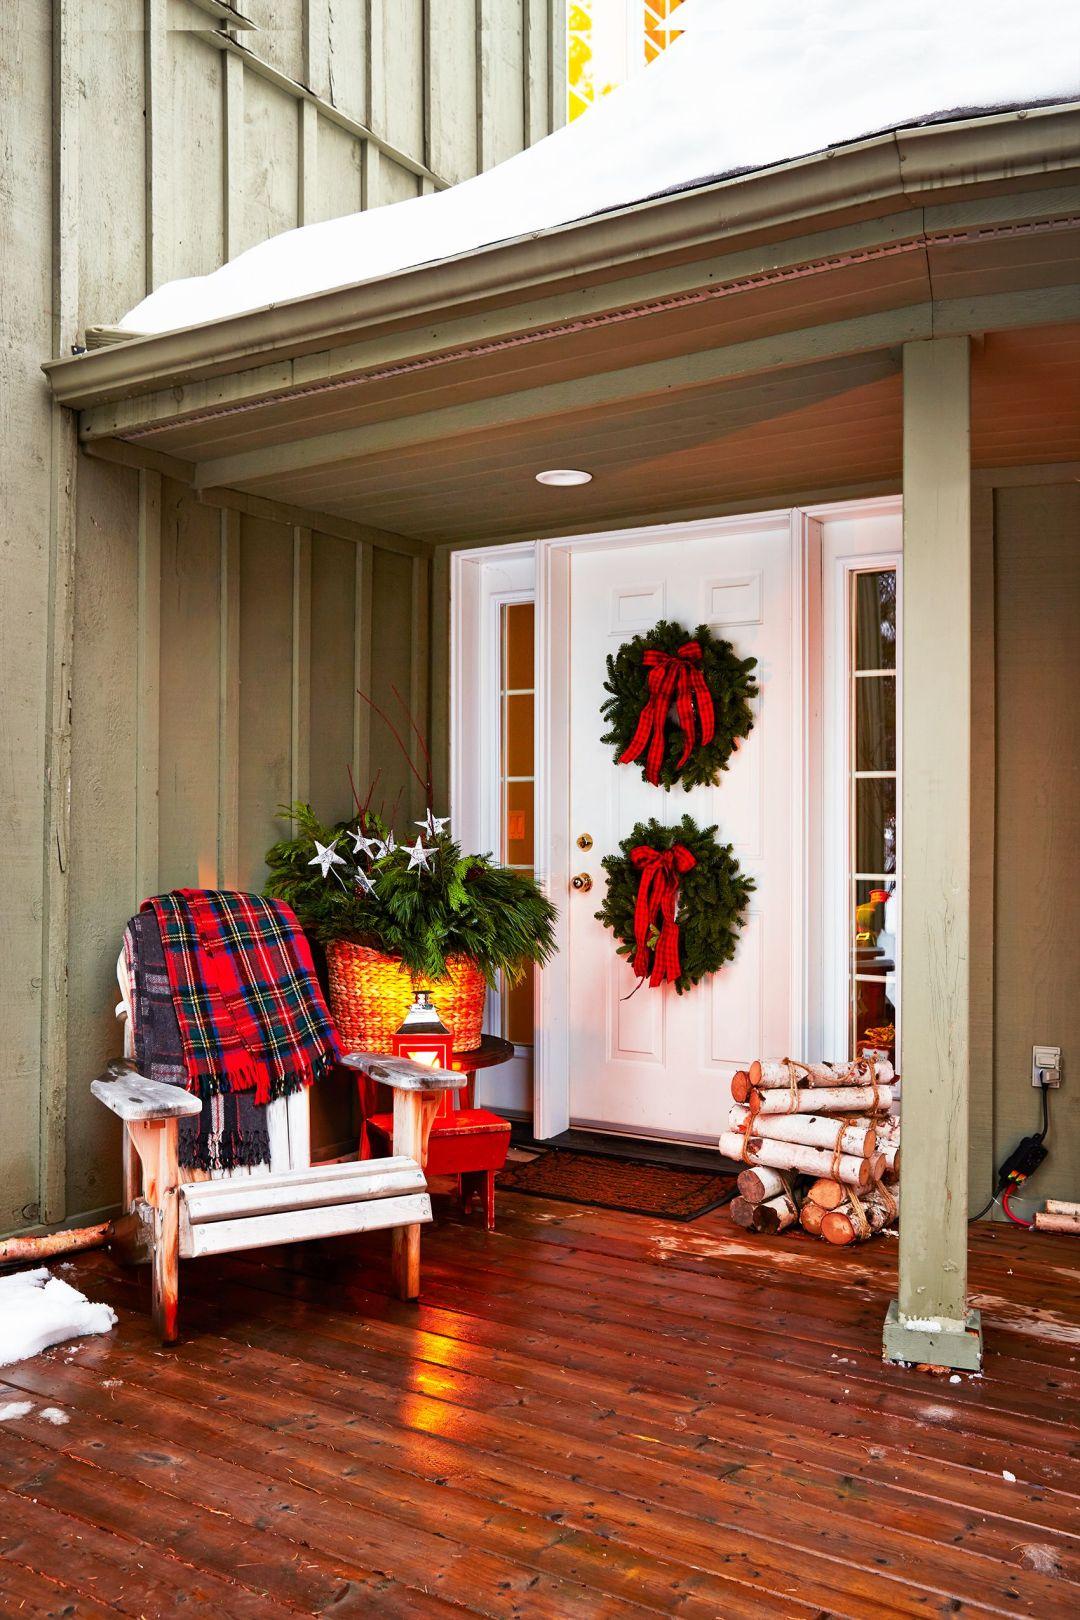 décoration de Noël en plein air bricolage